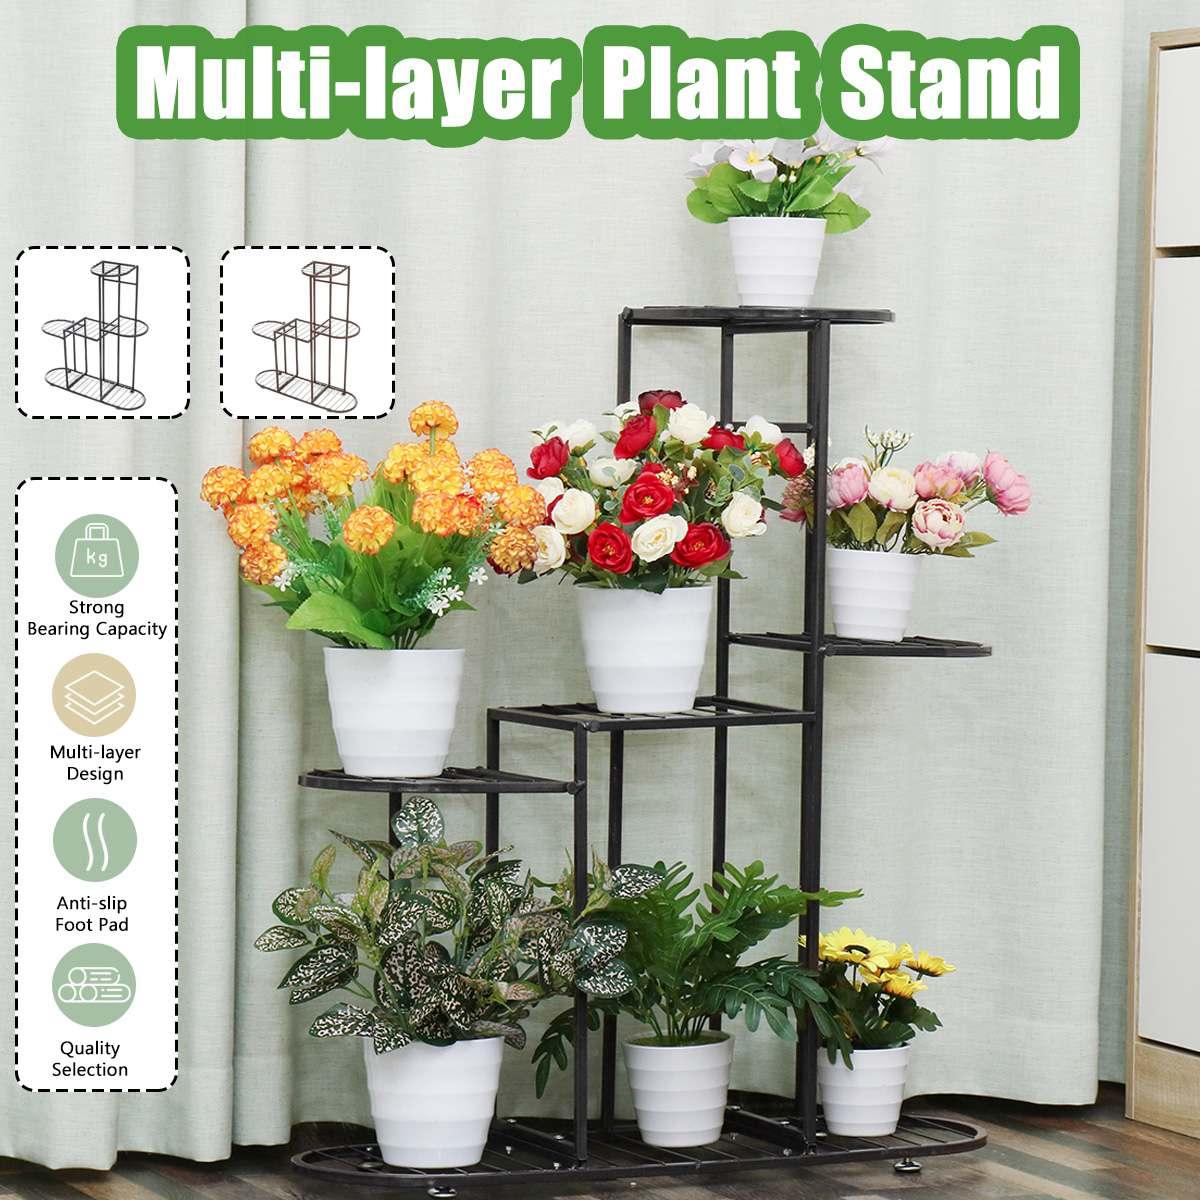 Multi Tier Metal Flower Plant Holder Stand Rack Yard Garden Patio Balcony Flower Stands Shelves Balcony Flower Rack Plant Pot